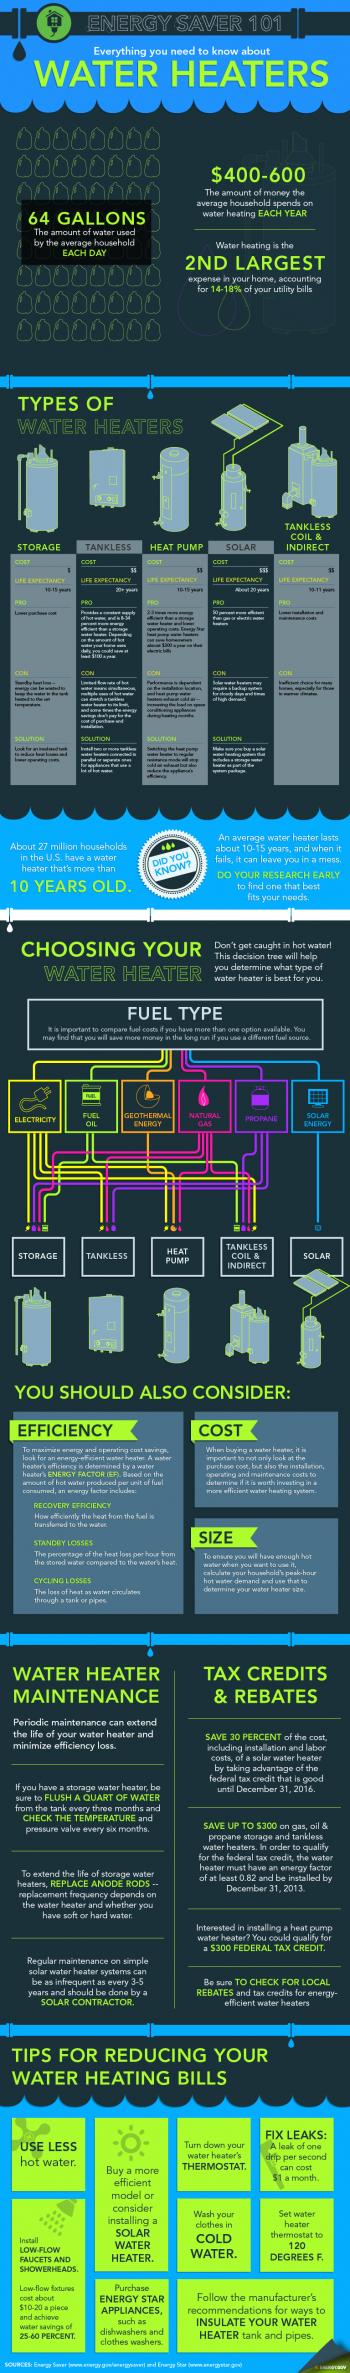 Tank Storage vs Tankless Water Heater @MeldrumDesign